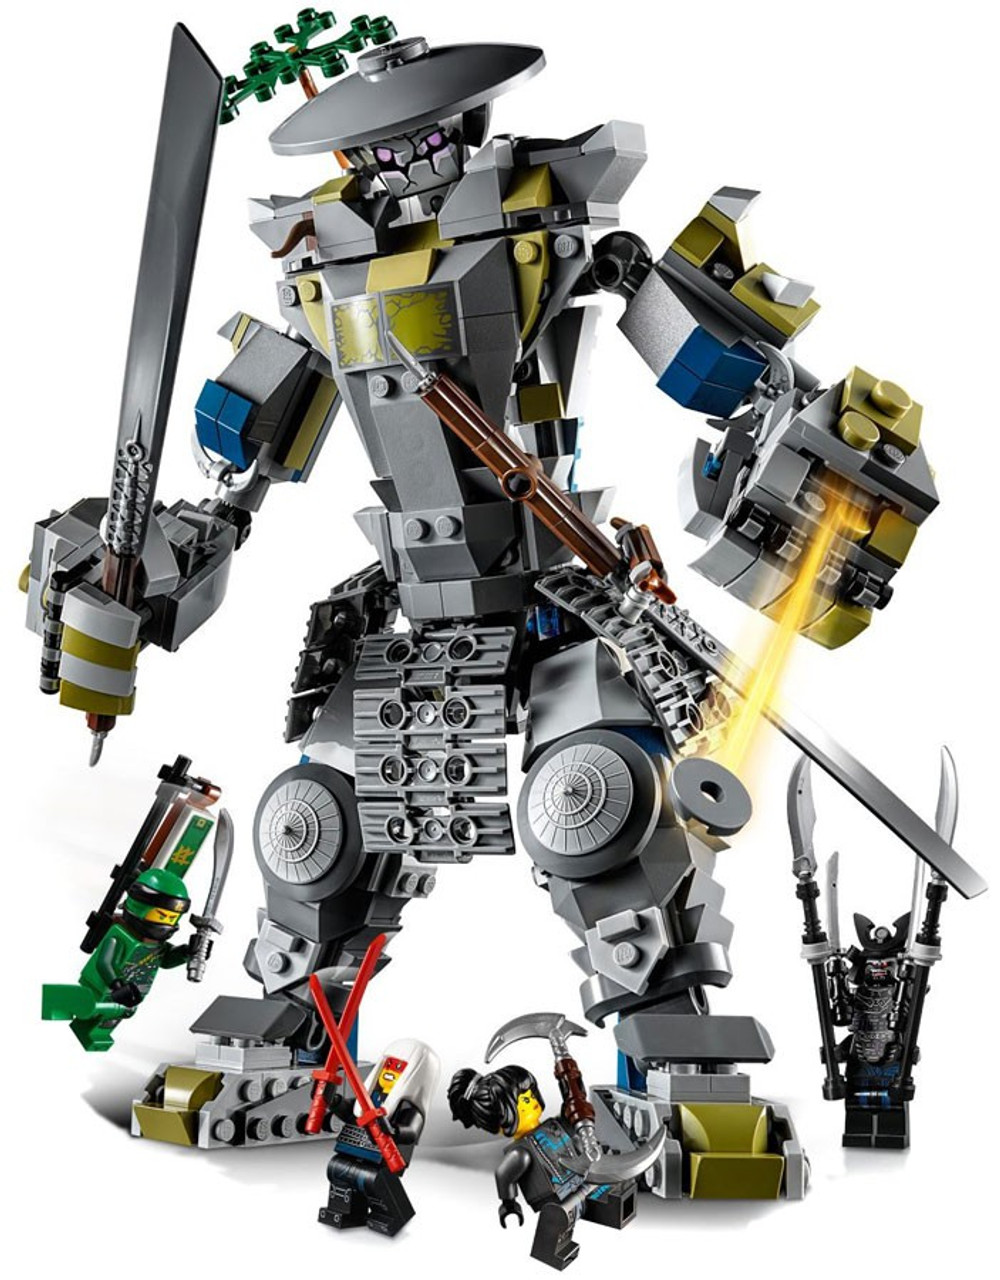 LEGO Ninjago Oni Titan Set 70658 - ToyWiz